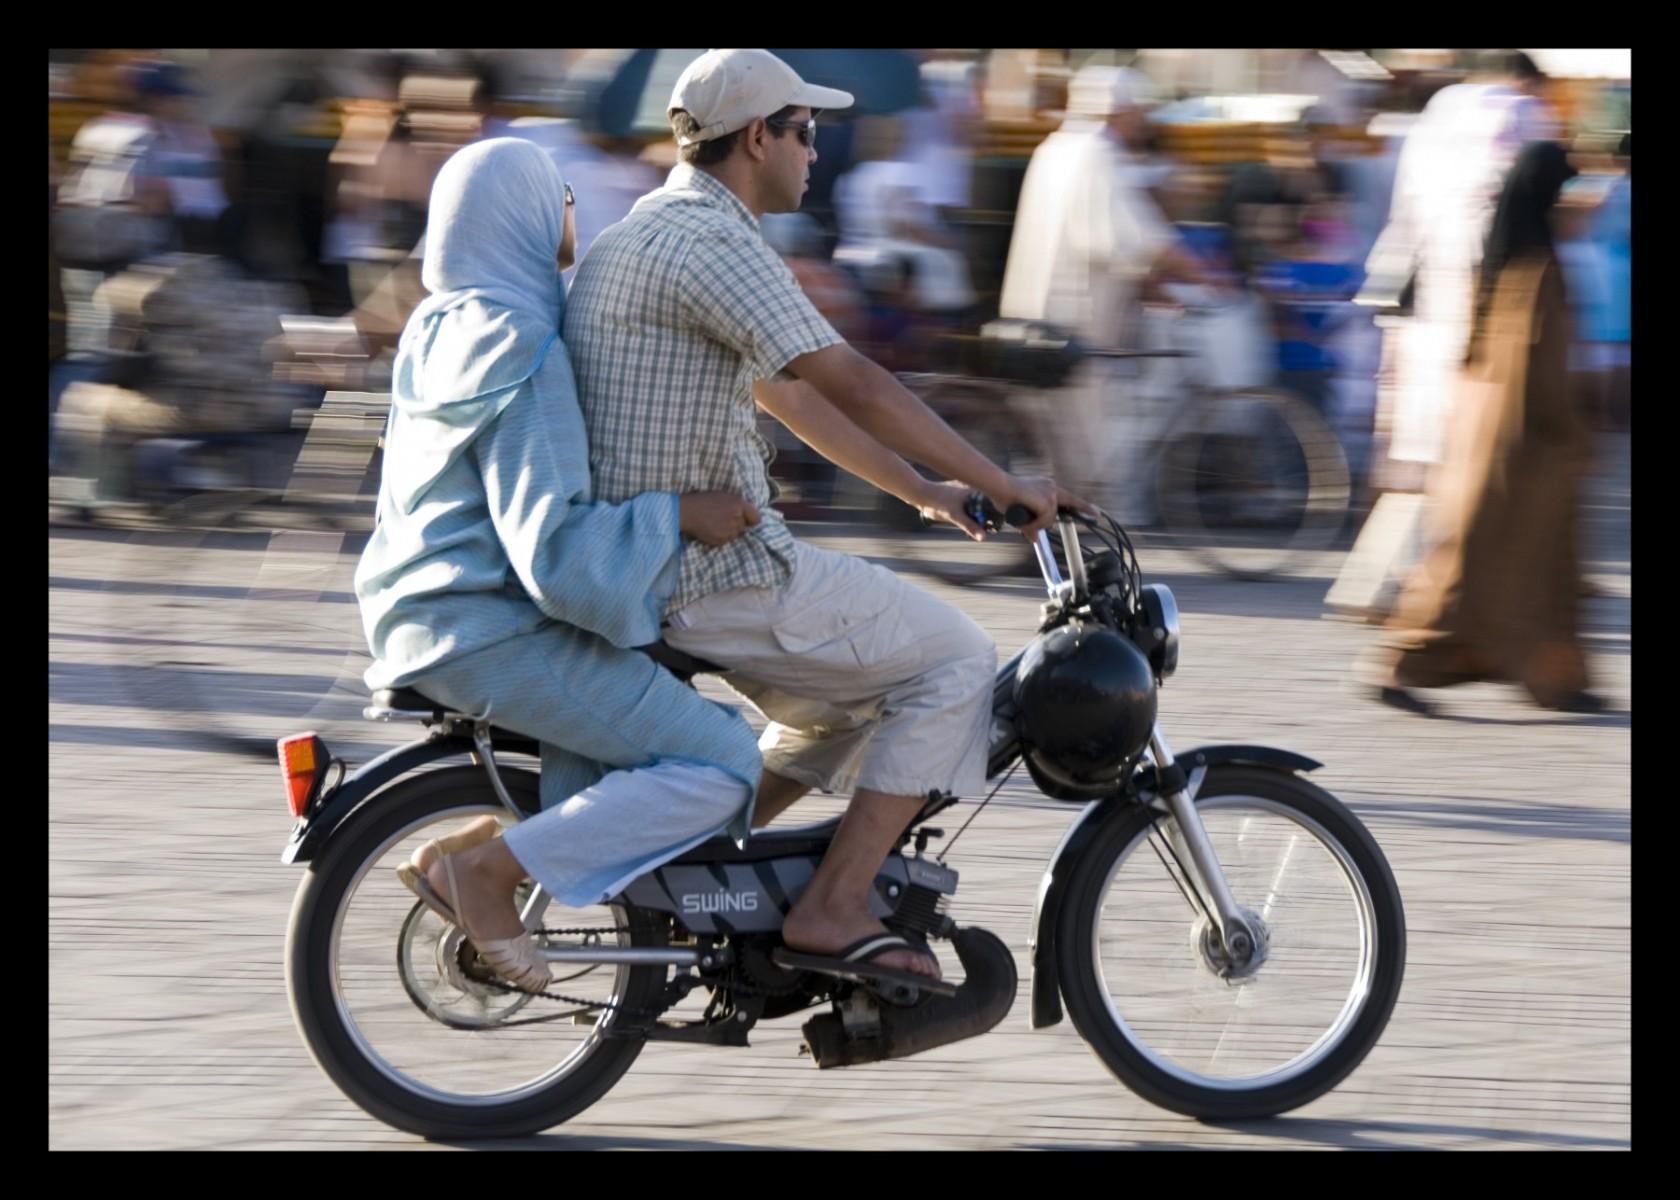 88314_DSC0122-jamal-el-fna-bikers Storie di Luce